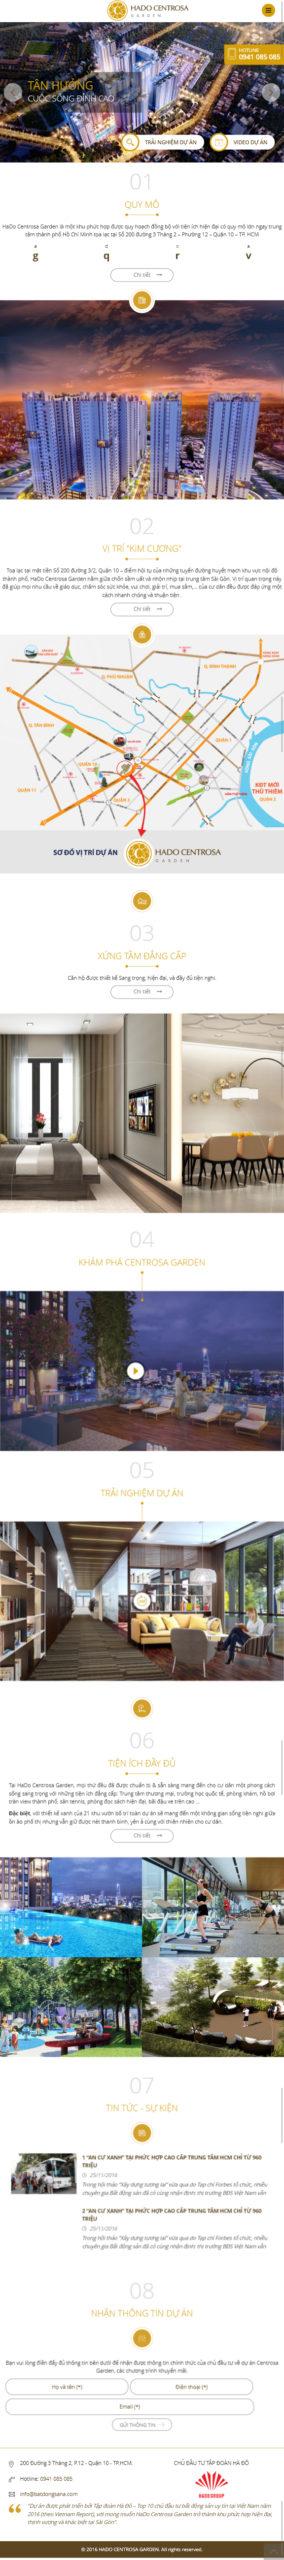 Mẫu website dự án Hà Đô Centrosa Garden